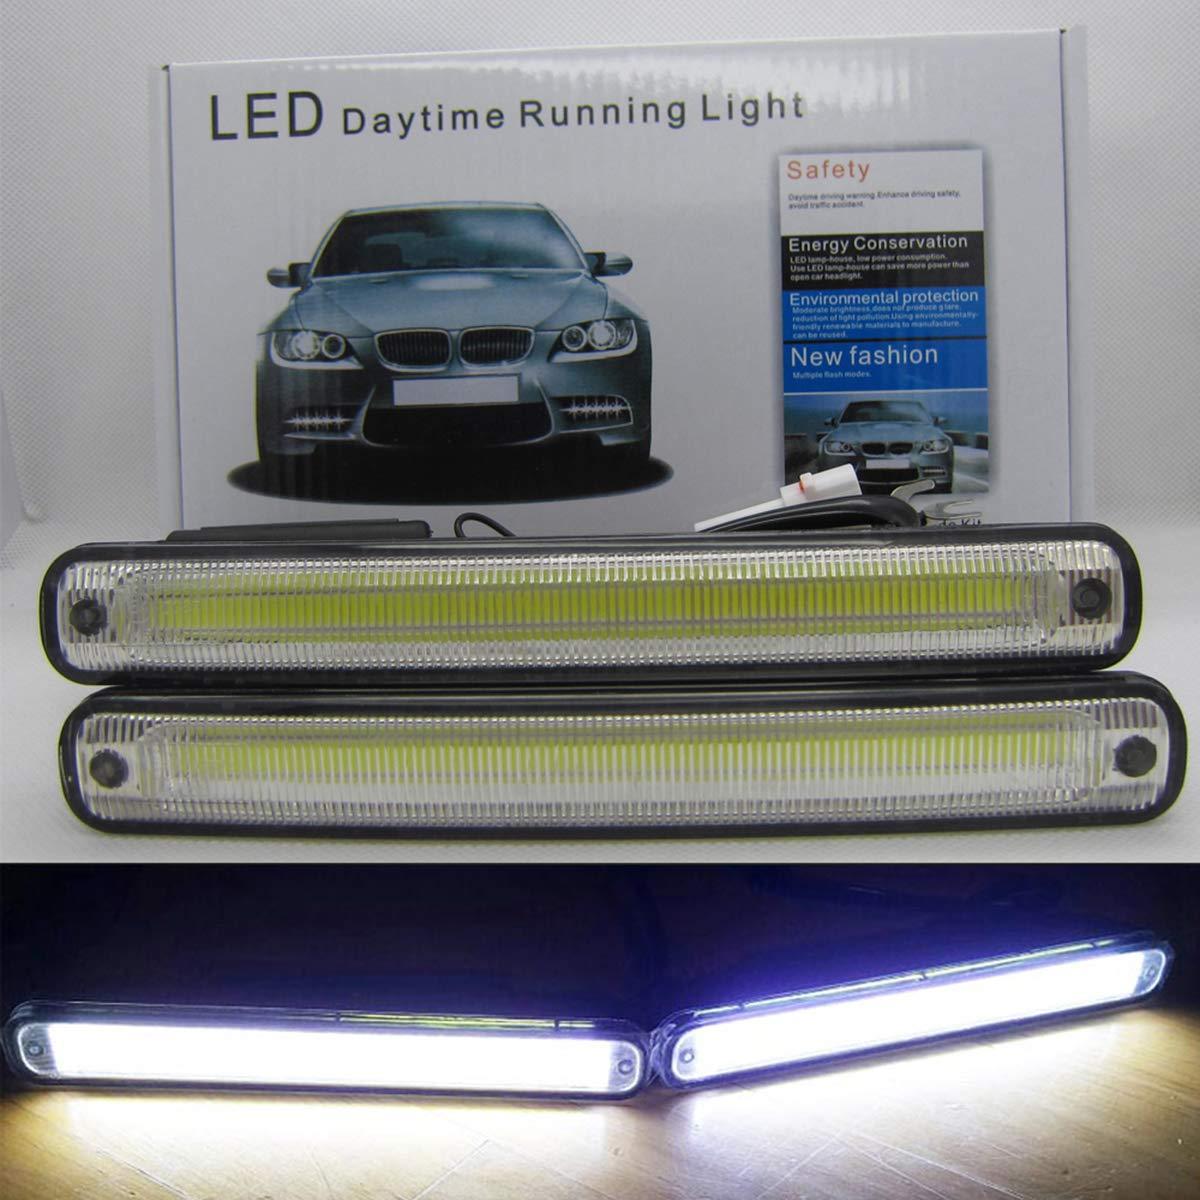 6000K Wei/ß DC 12V dimmbare Tagfahrleuchten VAWAR COB LED Tagfahrlicht mehr als ECE R87